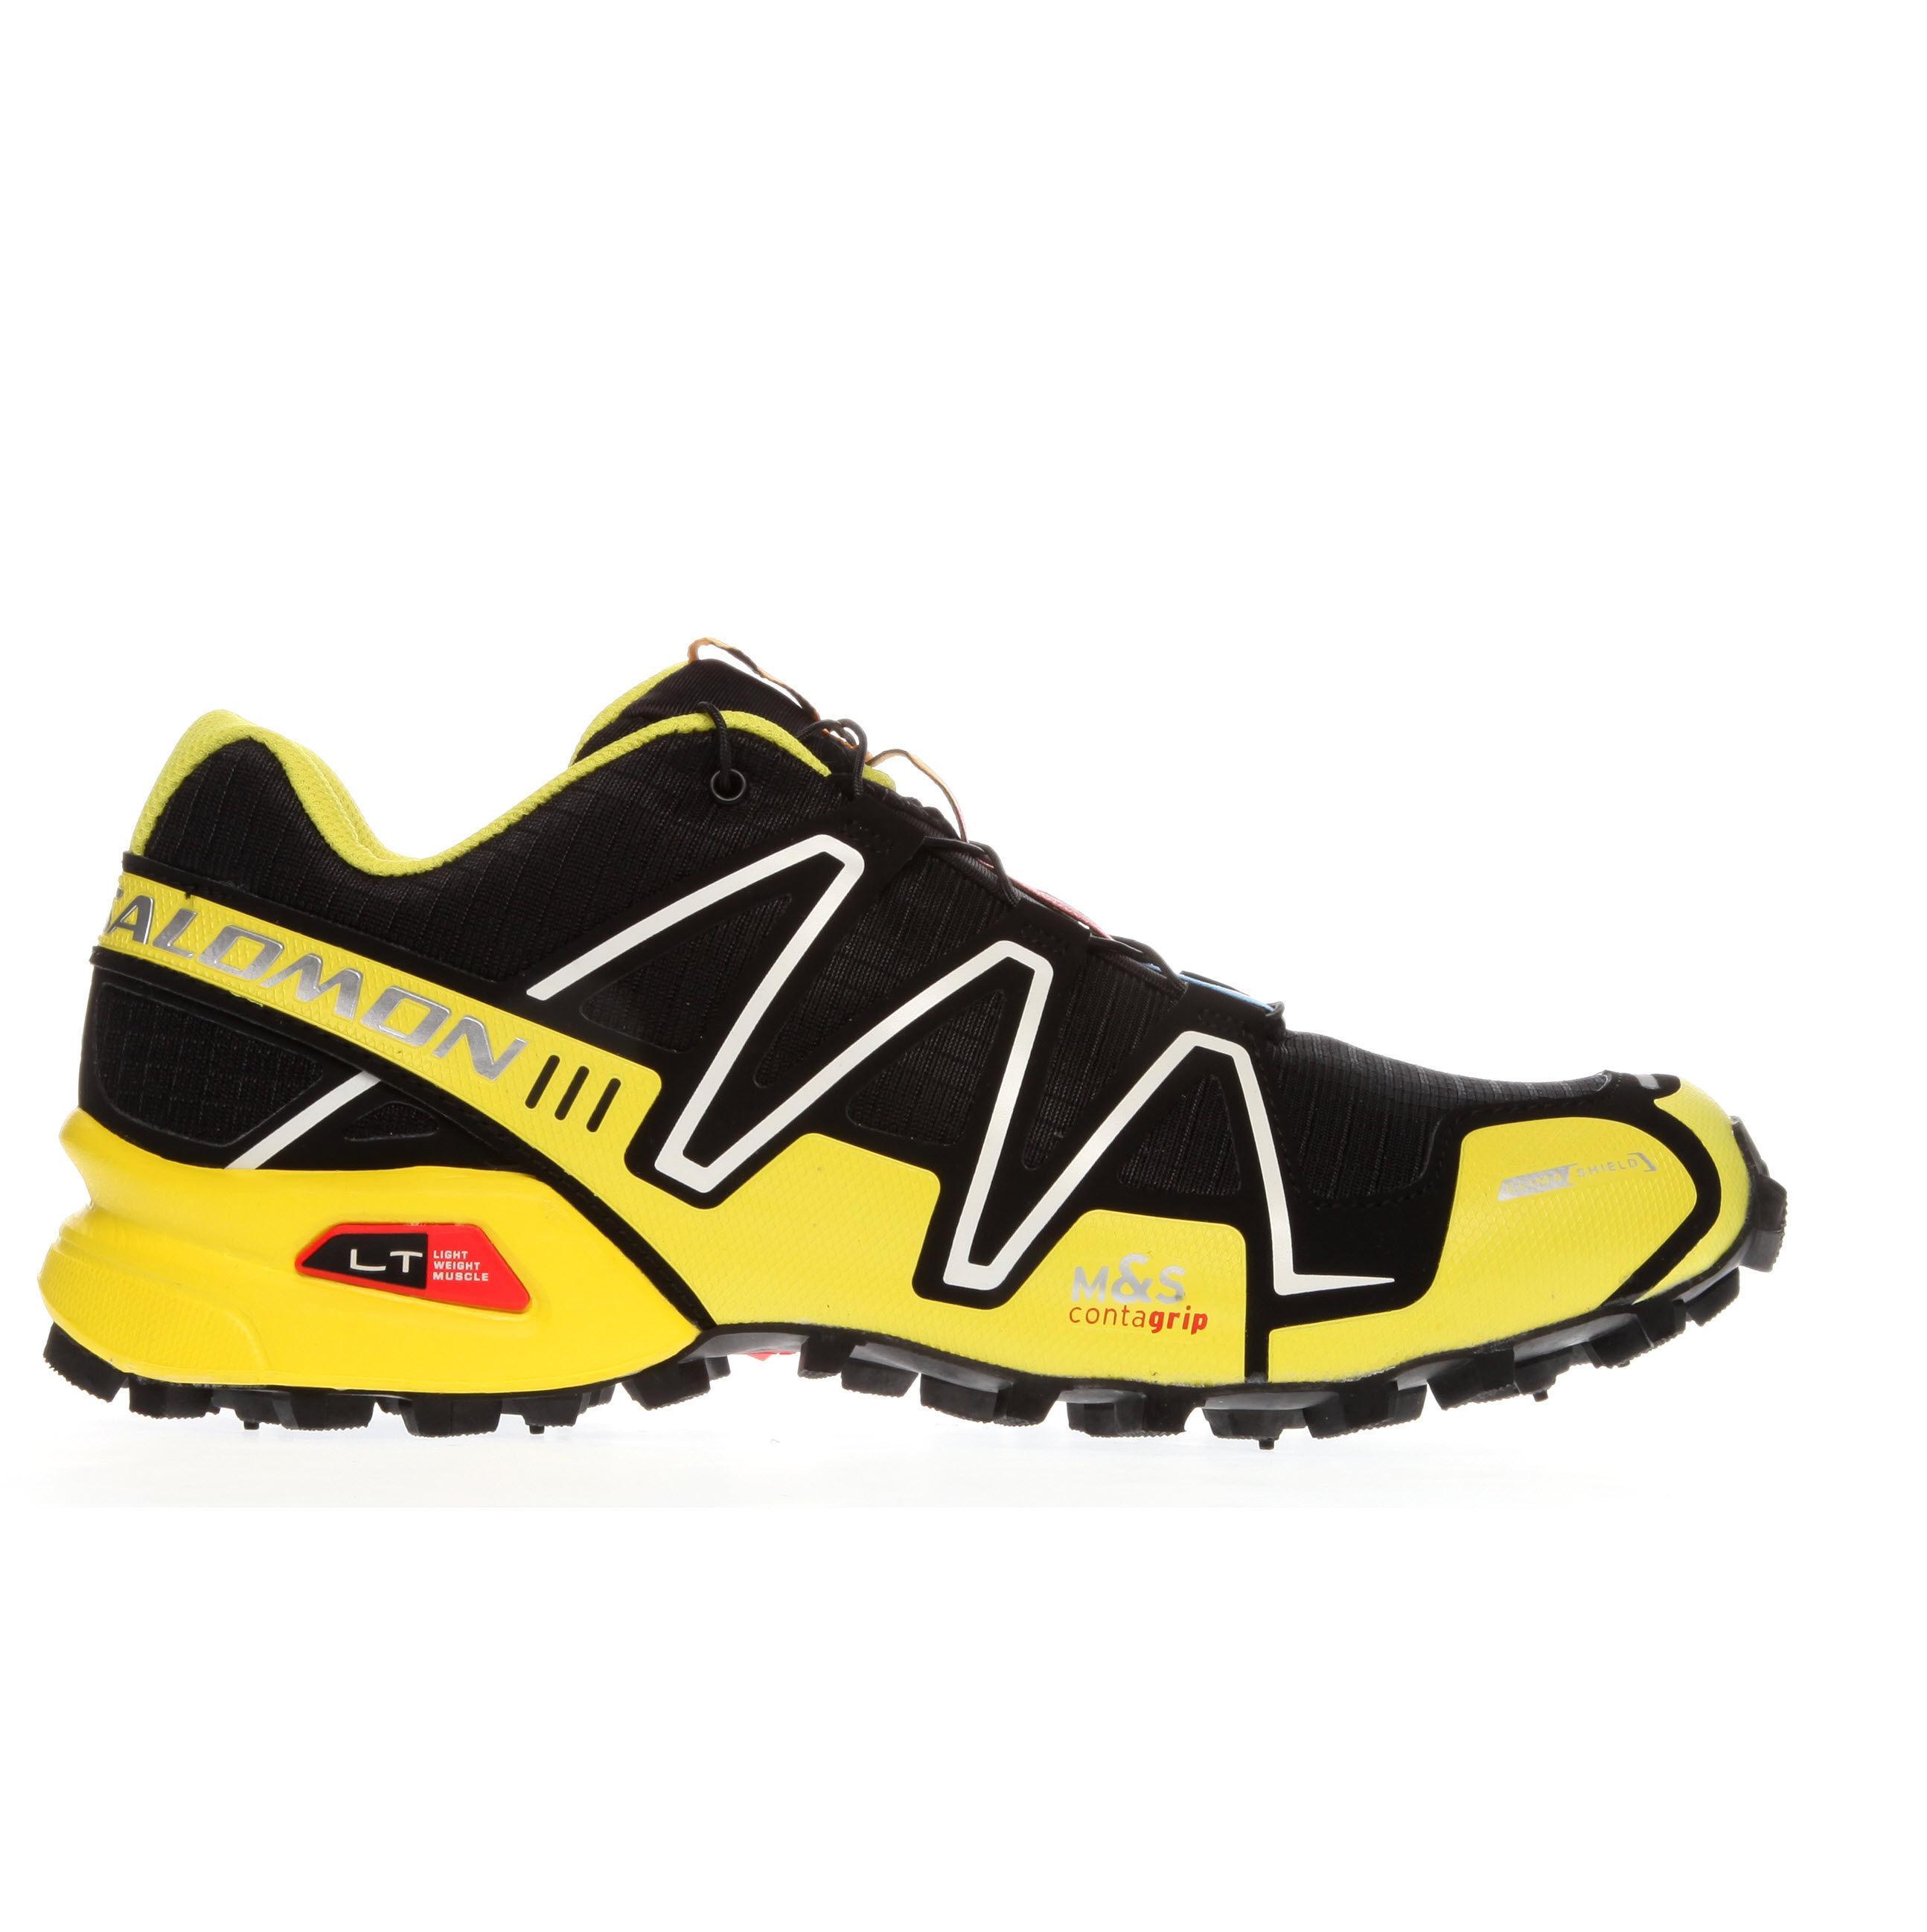 1f4fc6027 ... coupon code for cs cs cs 4 3 mujer zapatillas speedcross foto black para  salomon salomon